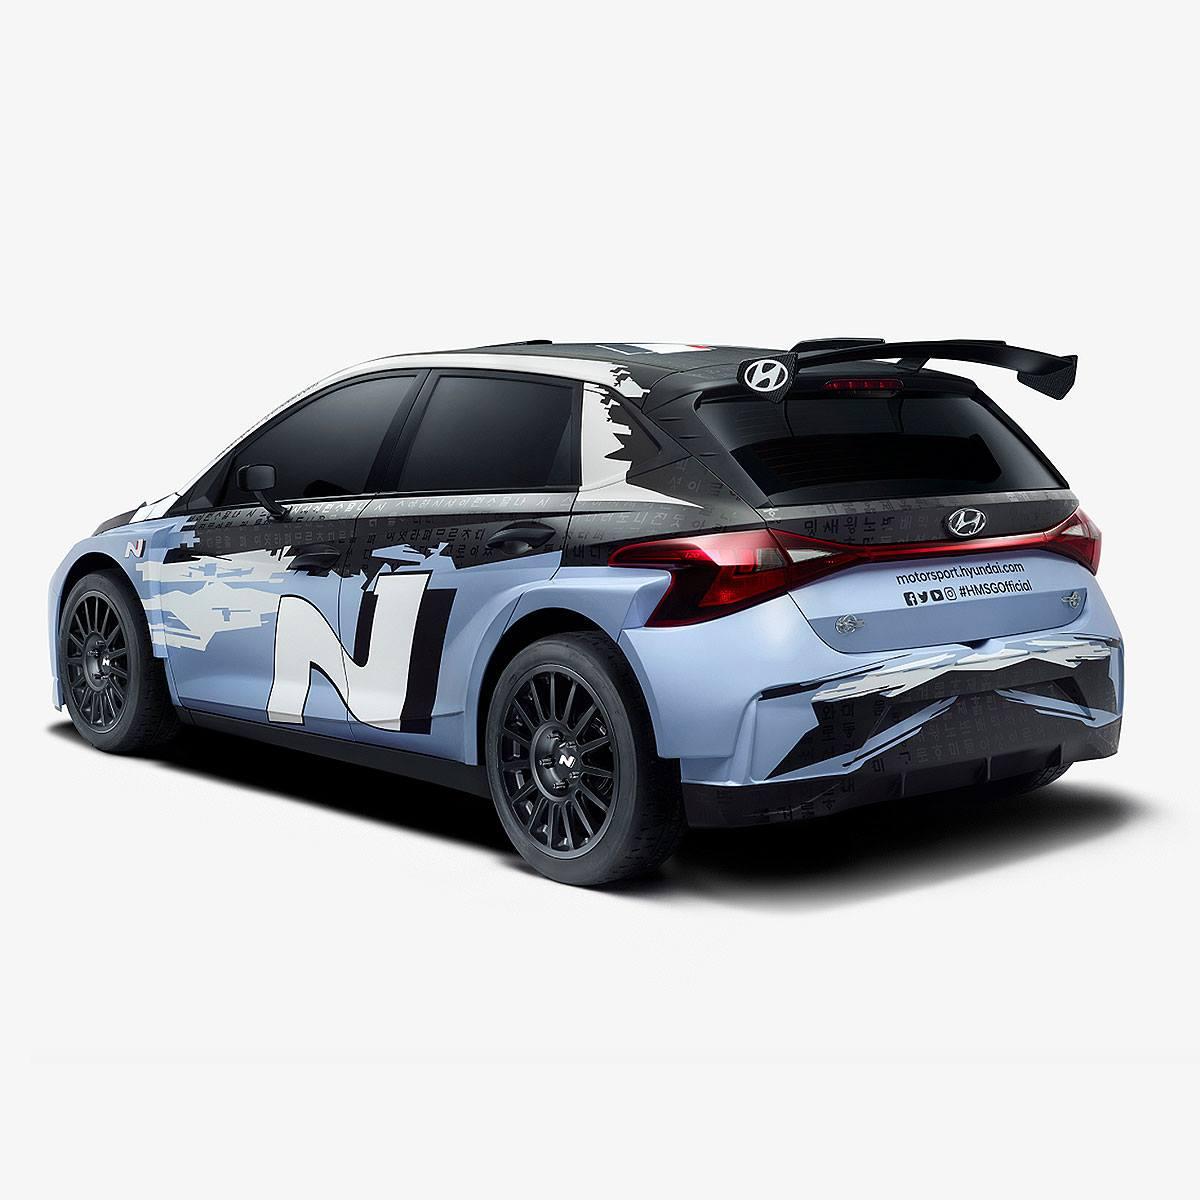 Hyundai-i20-N-rally-3